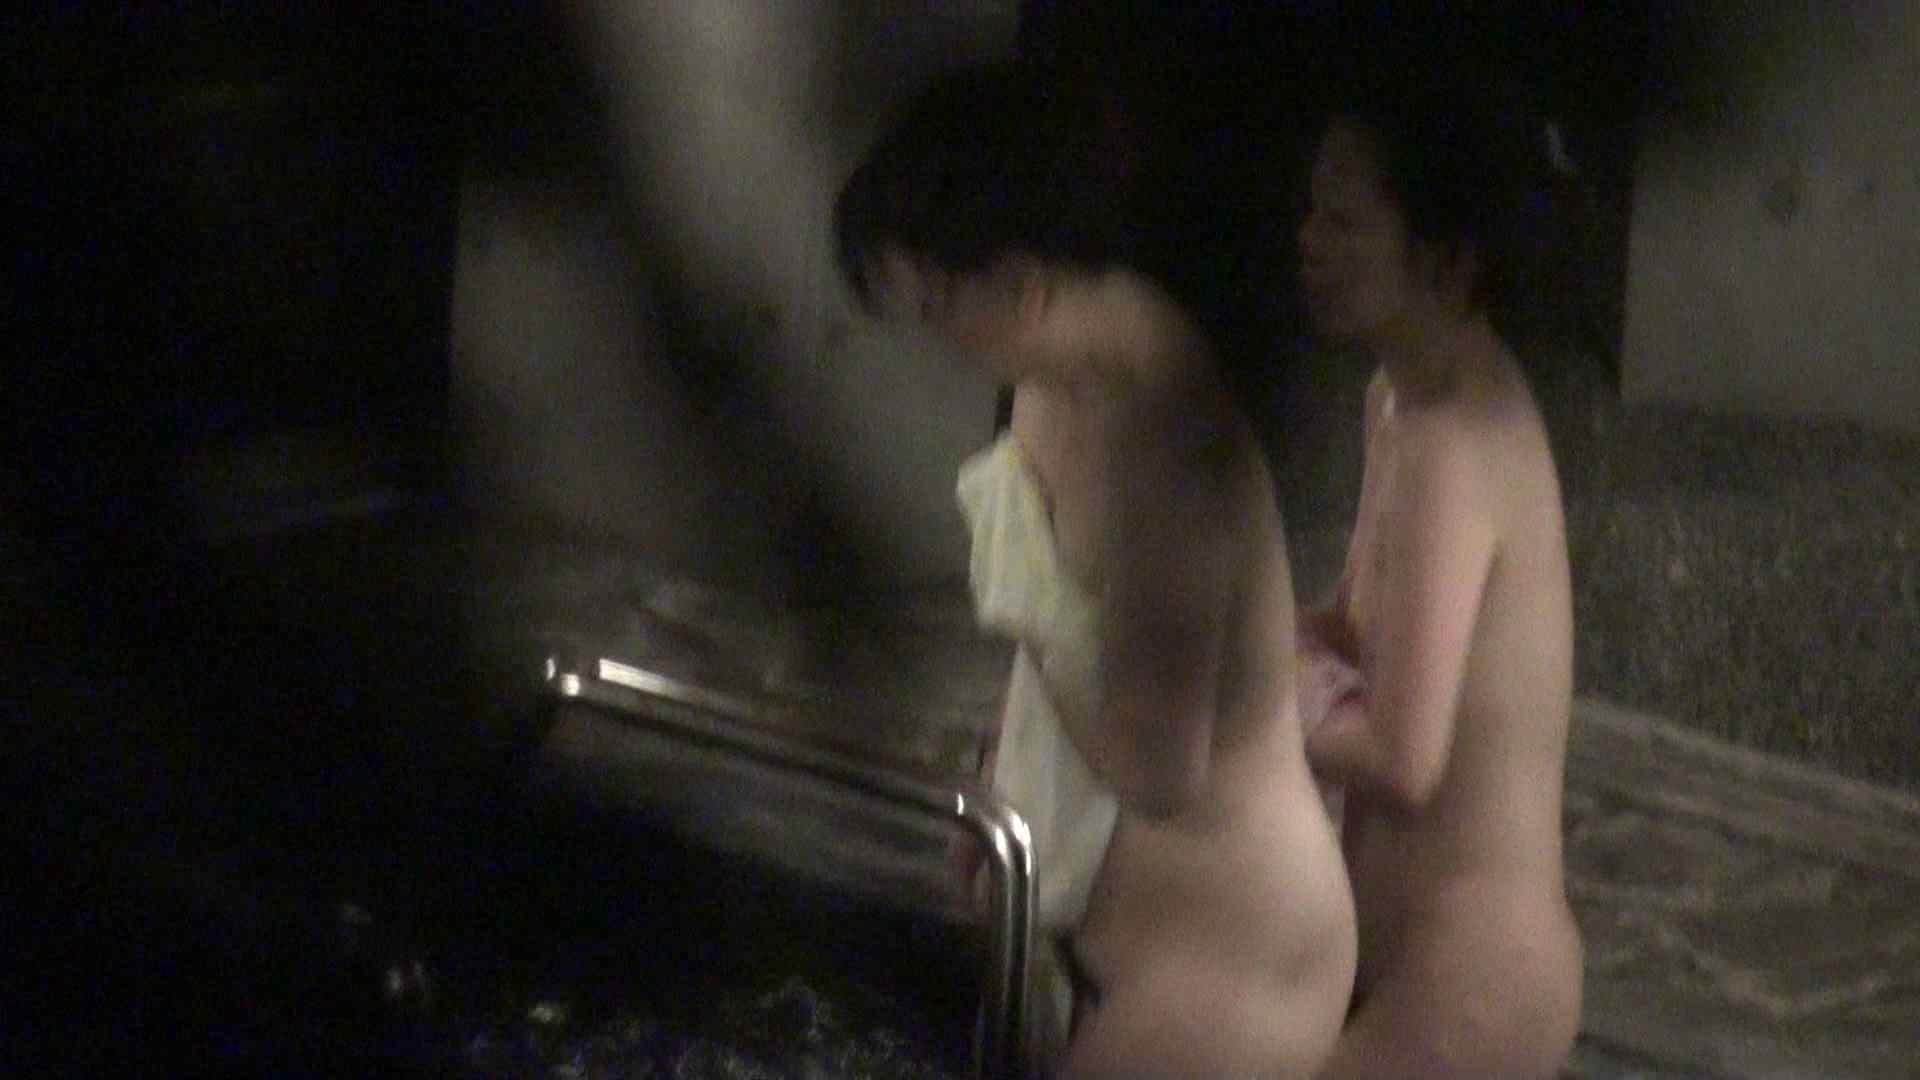 Aquaな露天風呂Vol.324 盗撮大放出 すけべAV動画紹介 52連発 3